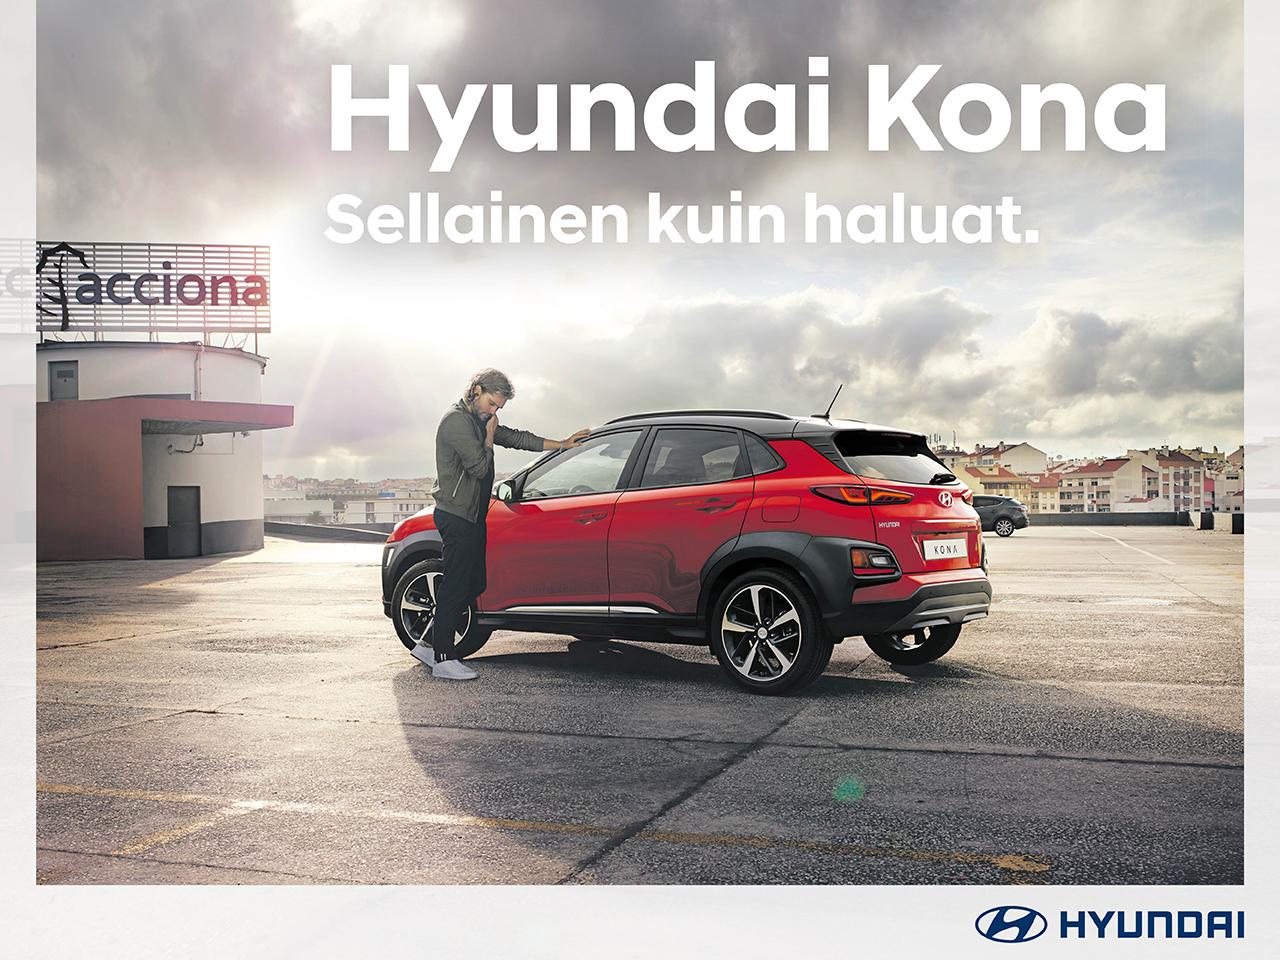 Hyundai Kona - metalliväri kaupan päälle